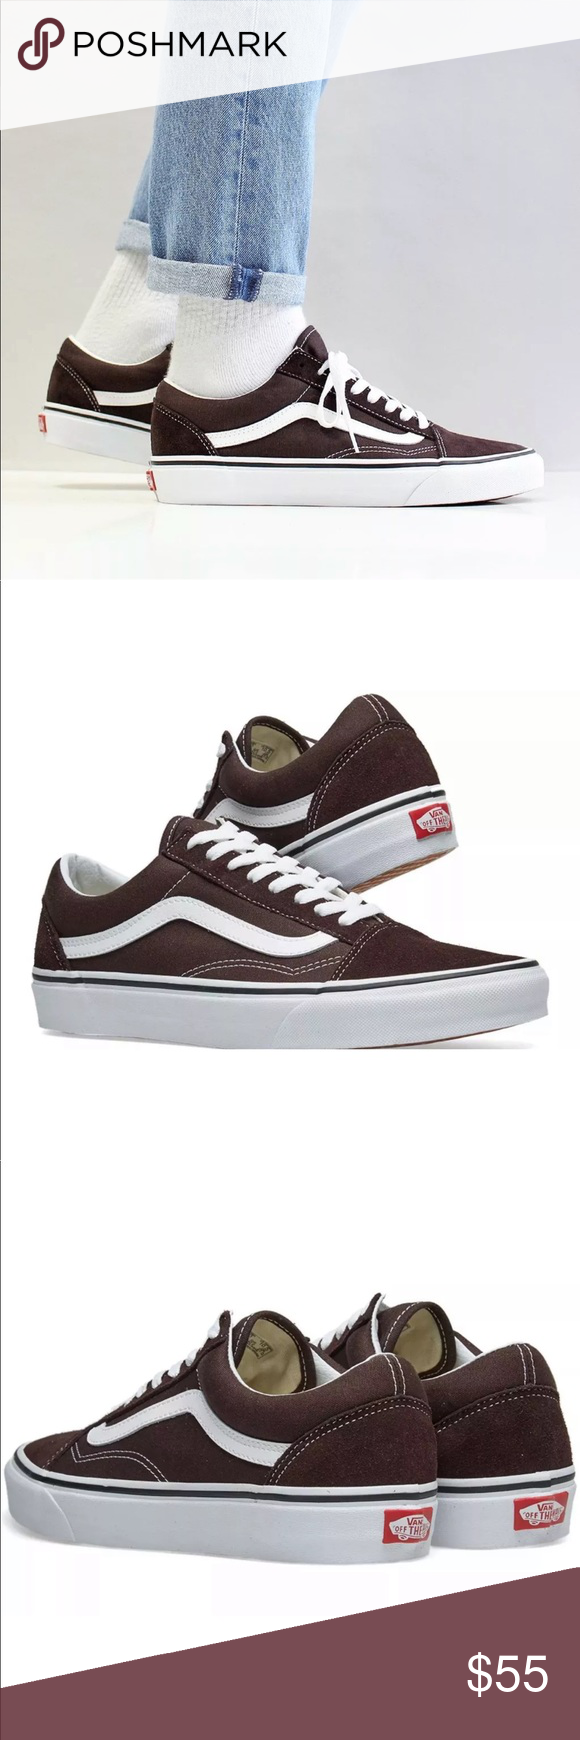 db617109027 Vans Men s Old Skool Chocolate Torte Skate Shoes NEW AUTHENTIC Vans Old  Skool Skate Shoes SIZE MEN S 12 US COLOR  Chocolate Torte True White  DESCRIPTION ...